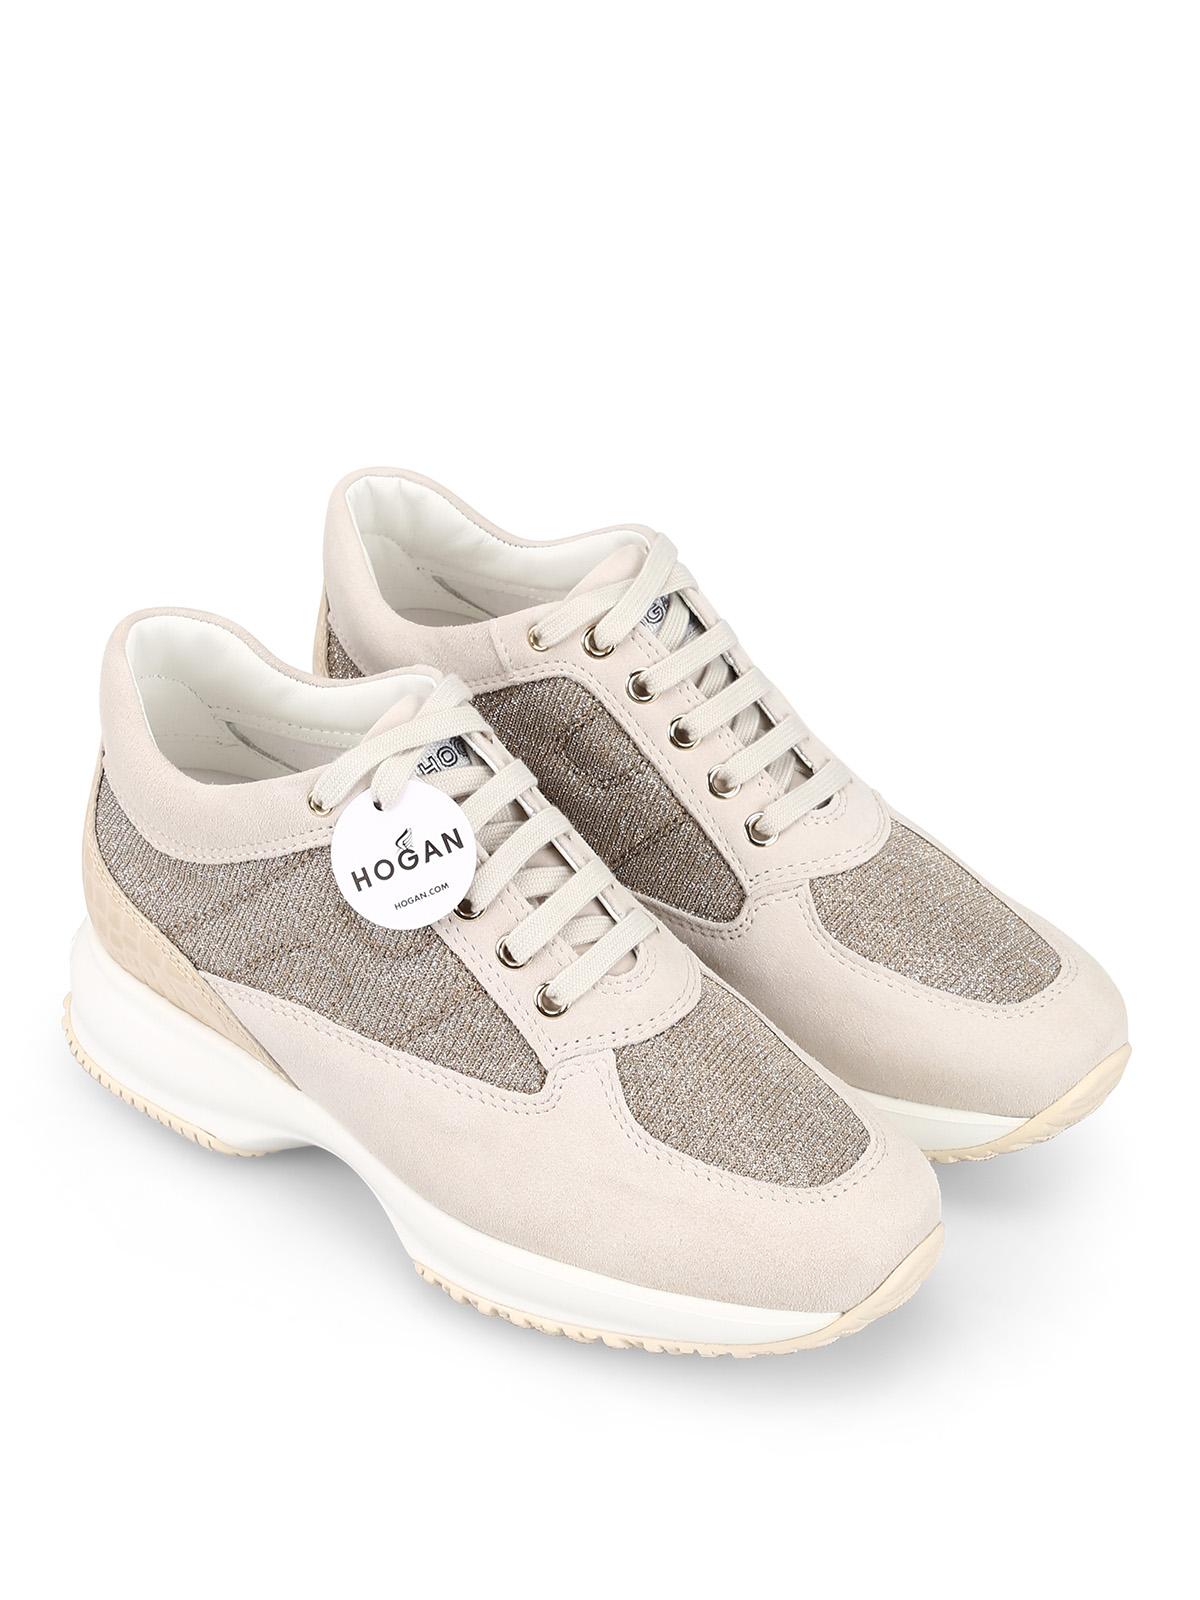 Trainers Hogan - Interactive beige suede and lurex sneakers ...